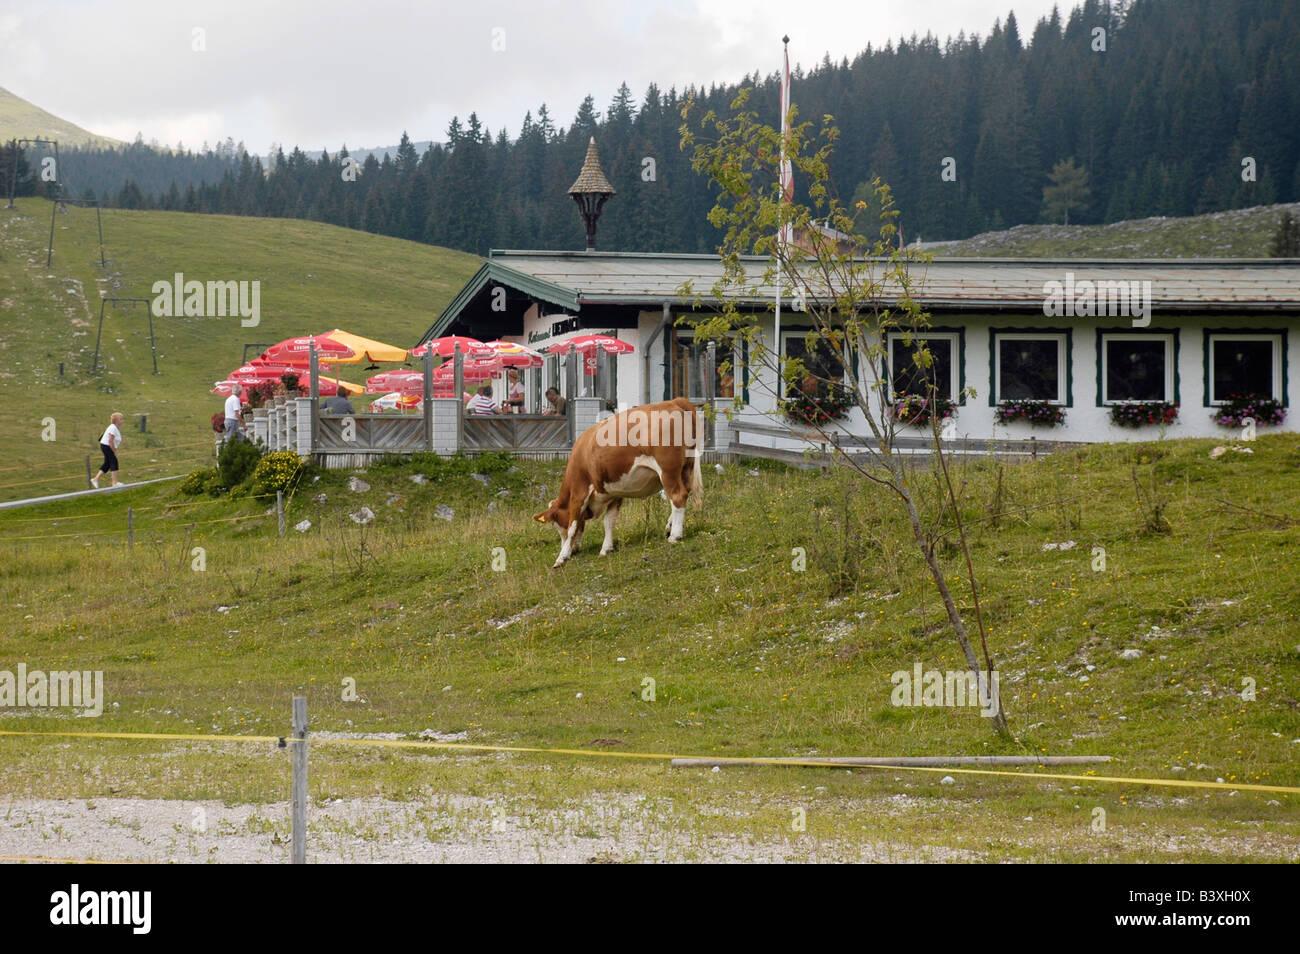 Austria Upper Austria Salzburg St Gilgen in the Dachstein Mountains A rural view of a grazing cow - Stock Image